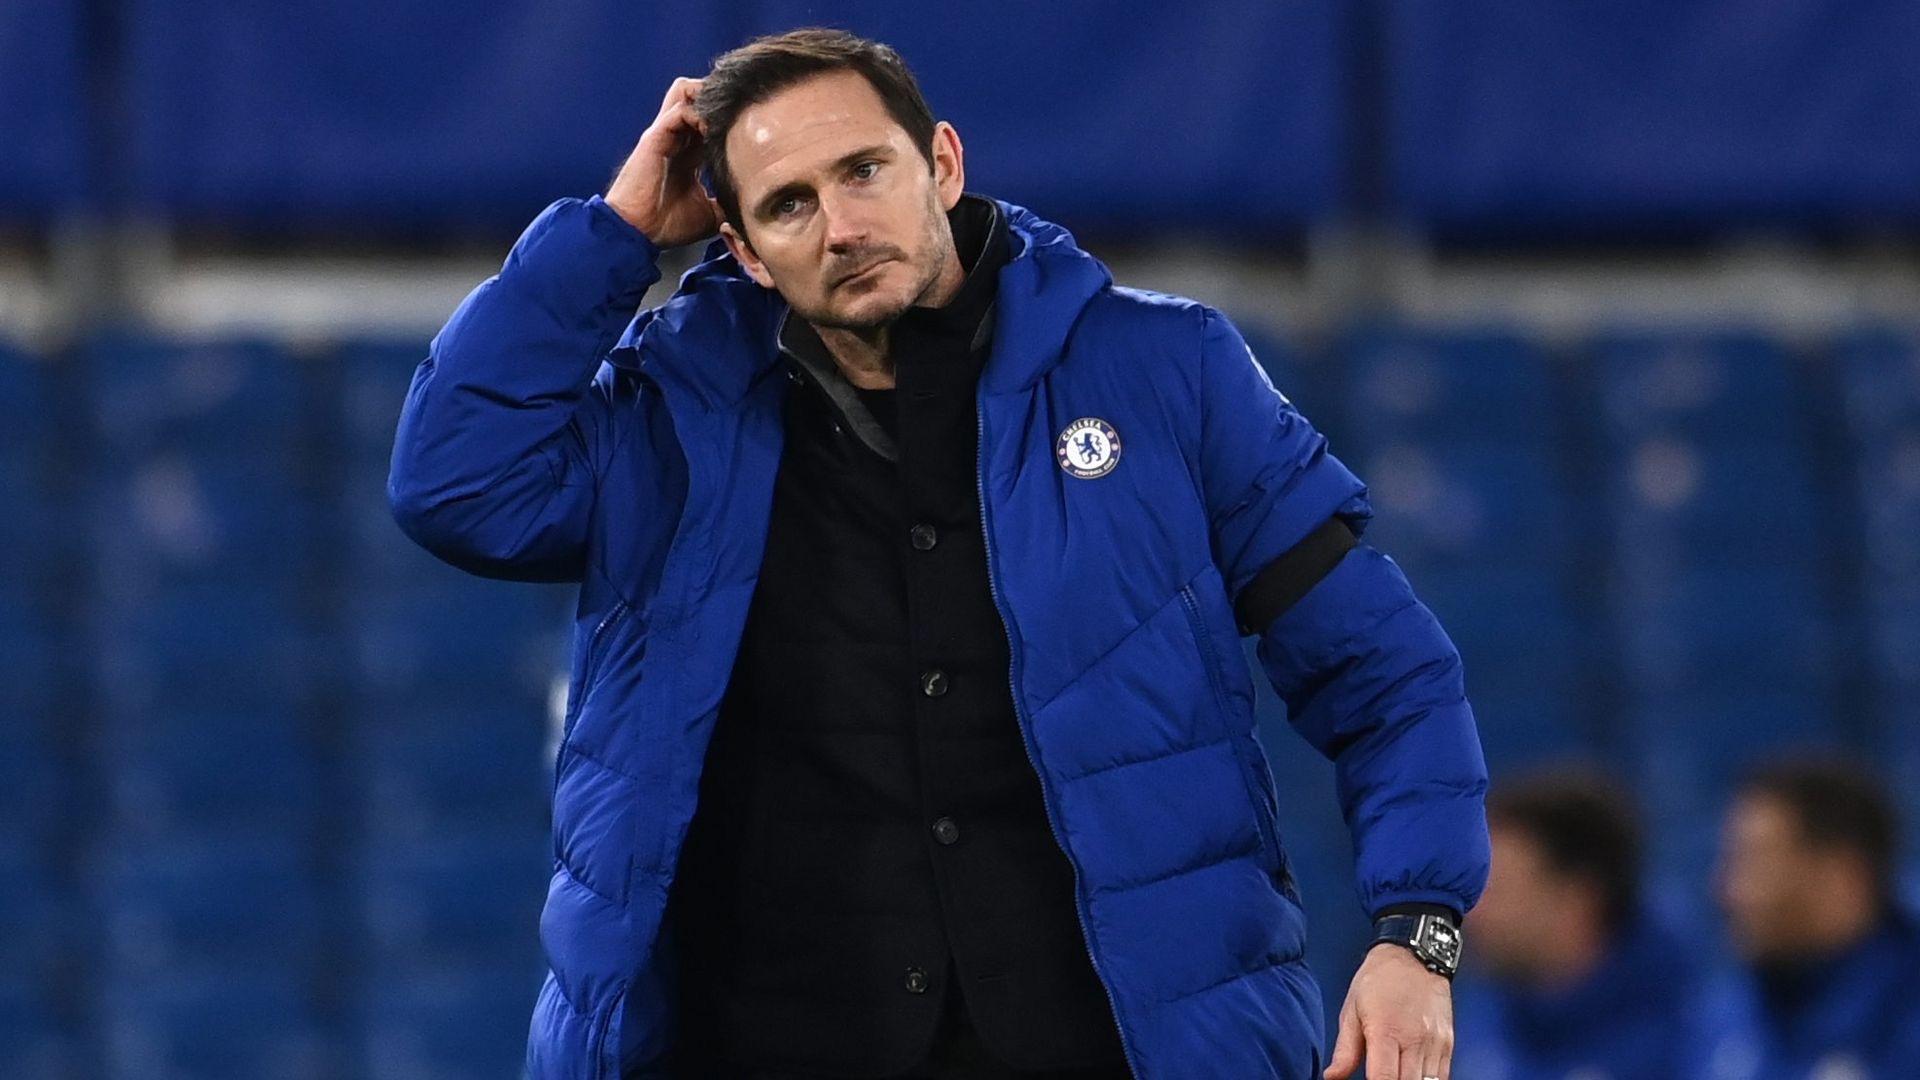 Mercato : Chelsea va licencier Lampard pour nommer Tuchel !